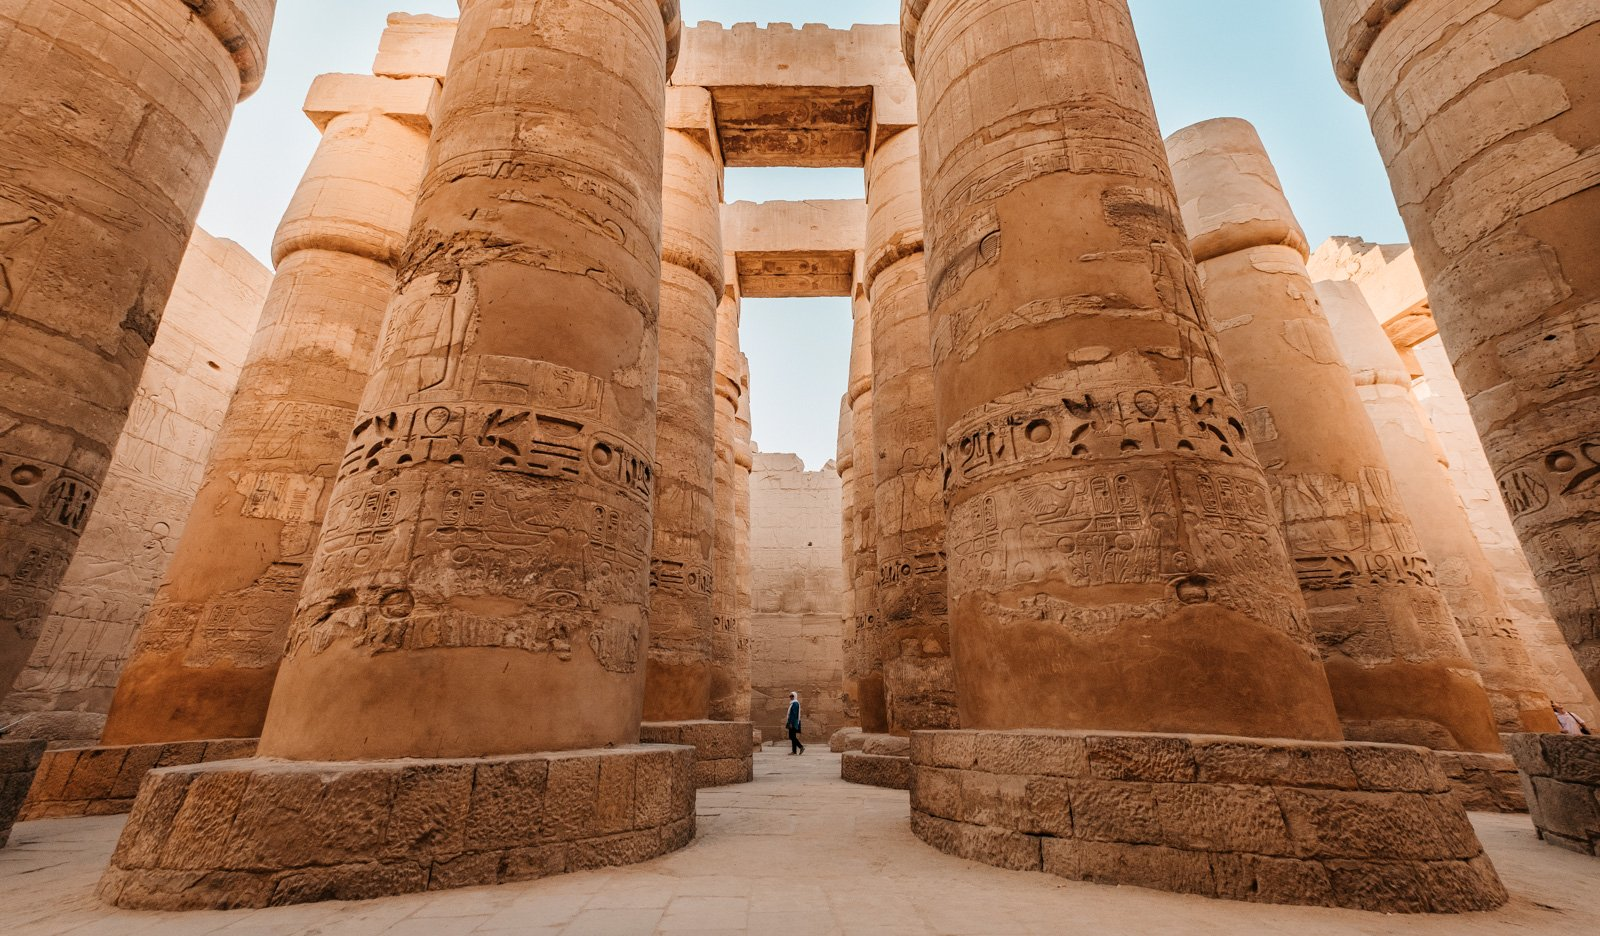 Massive pillars near the pyramids in Egypt